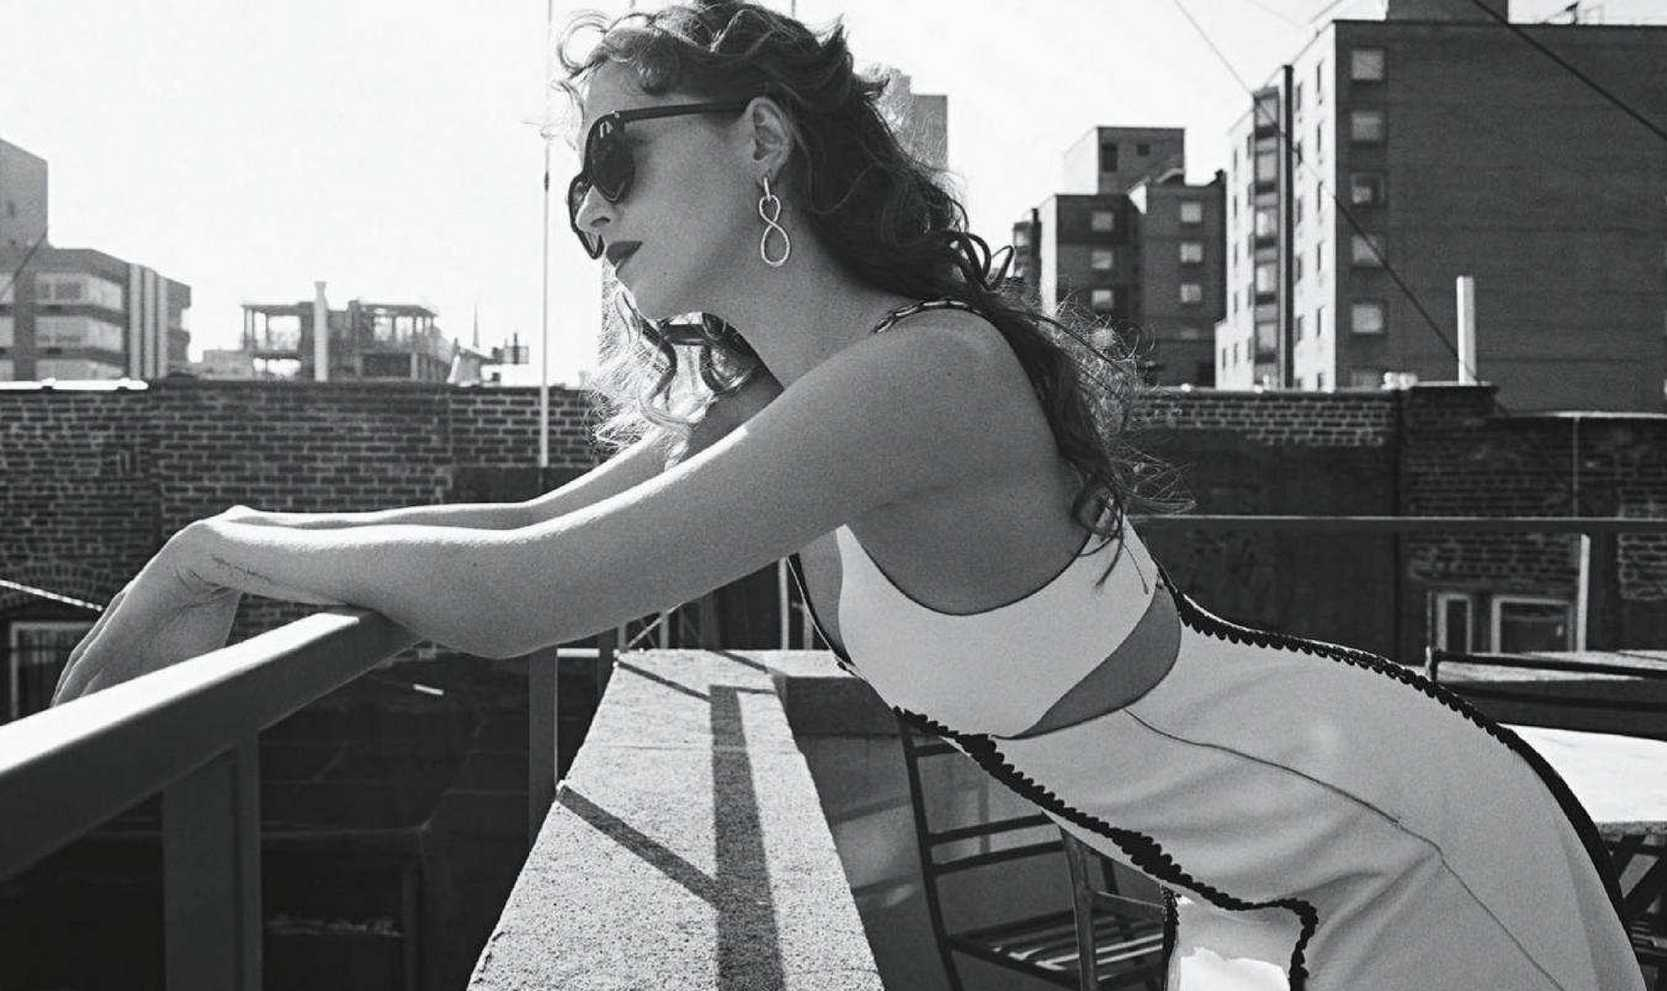 Dakota-Johnson-Emma-Summerton-Photoshoot-for-Vogue-Australia-October-2018bfe326982742424 (1).jpg